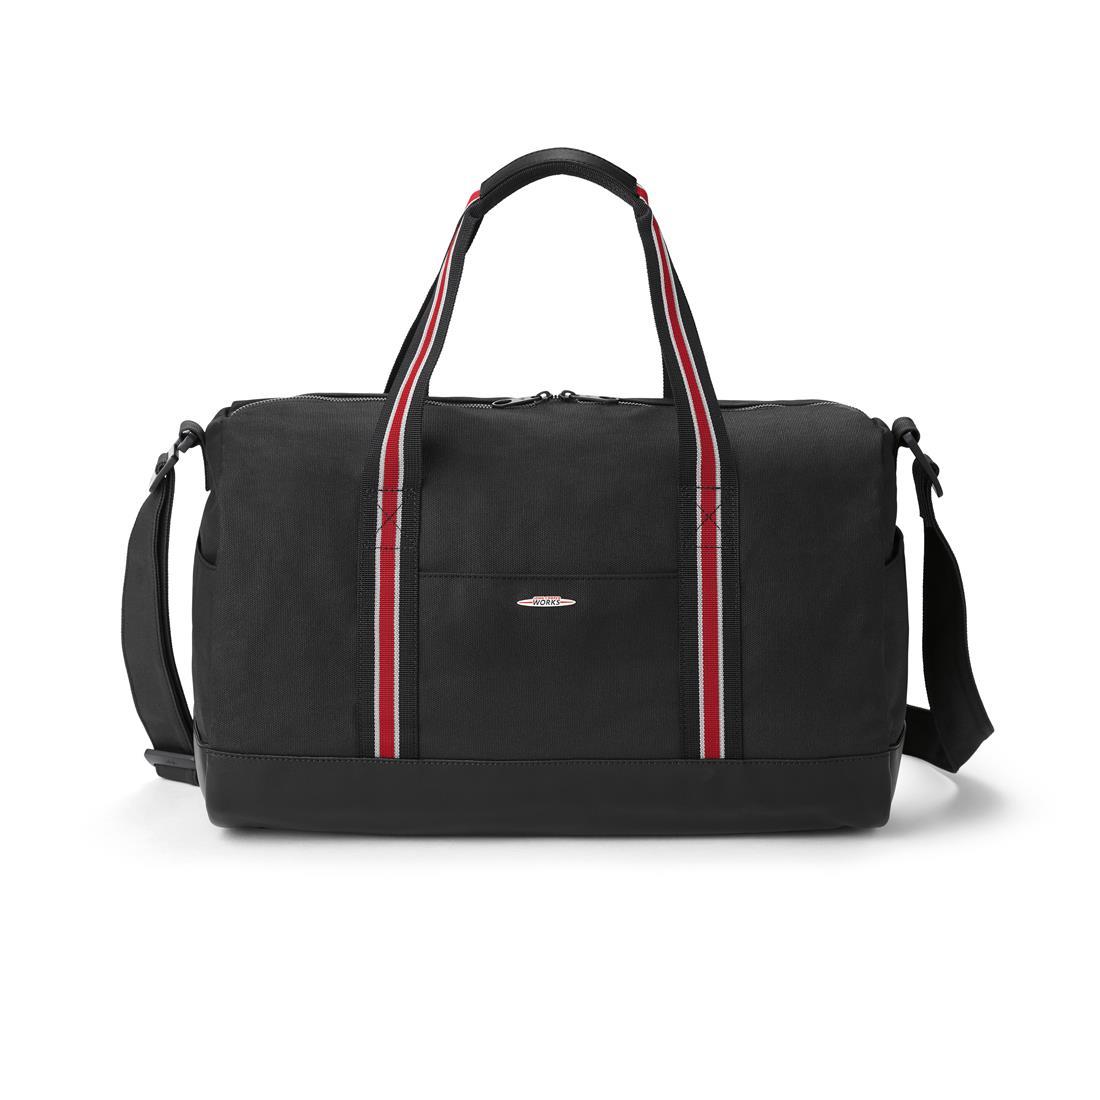 d15b89a21f ShopMINIUSA.com  MINI JCW Duffle Bag Black